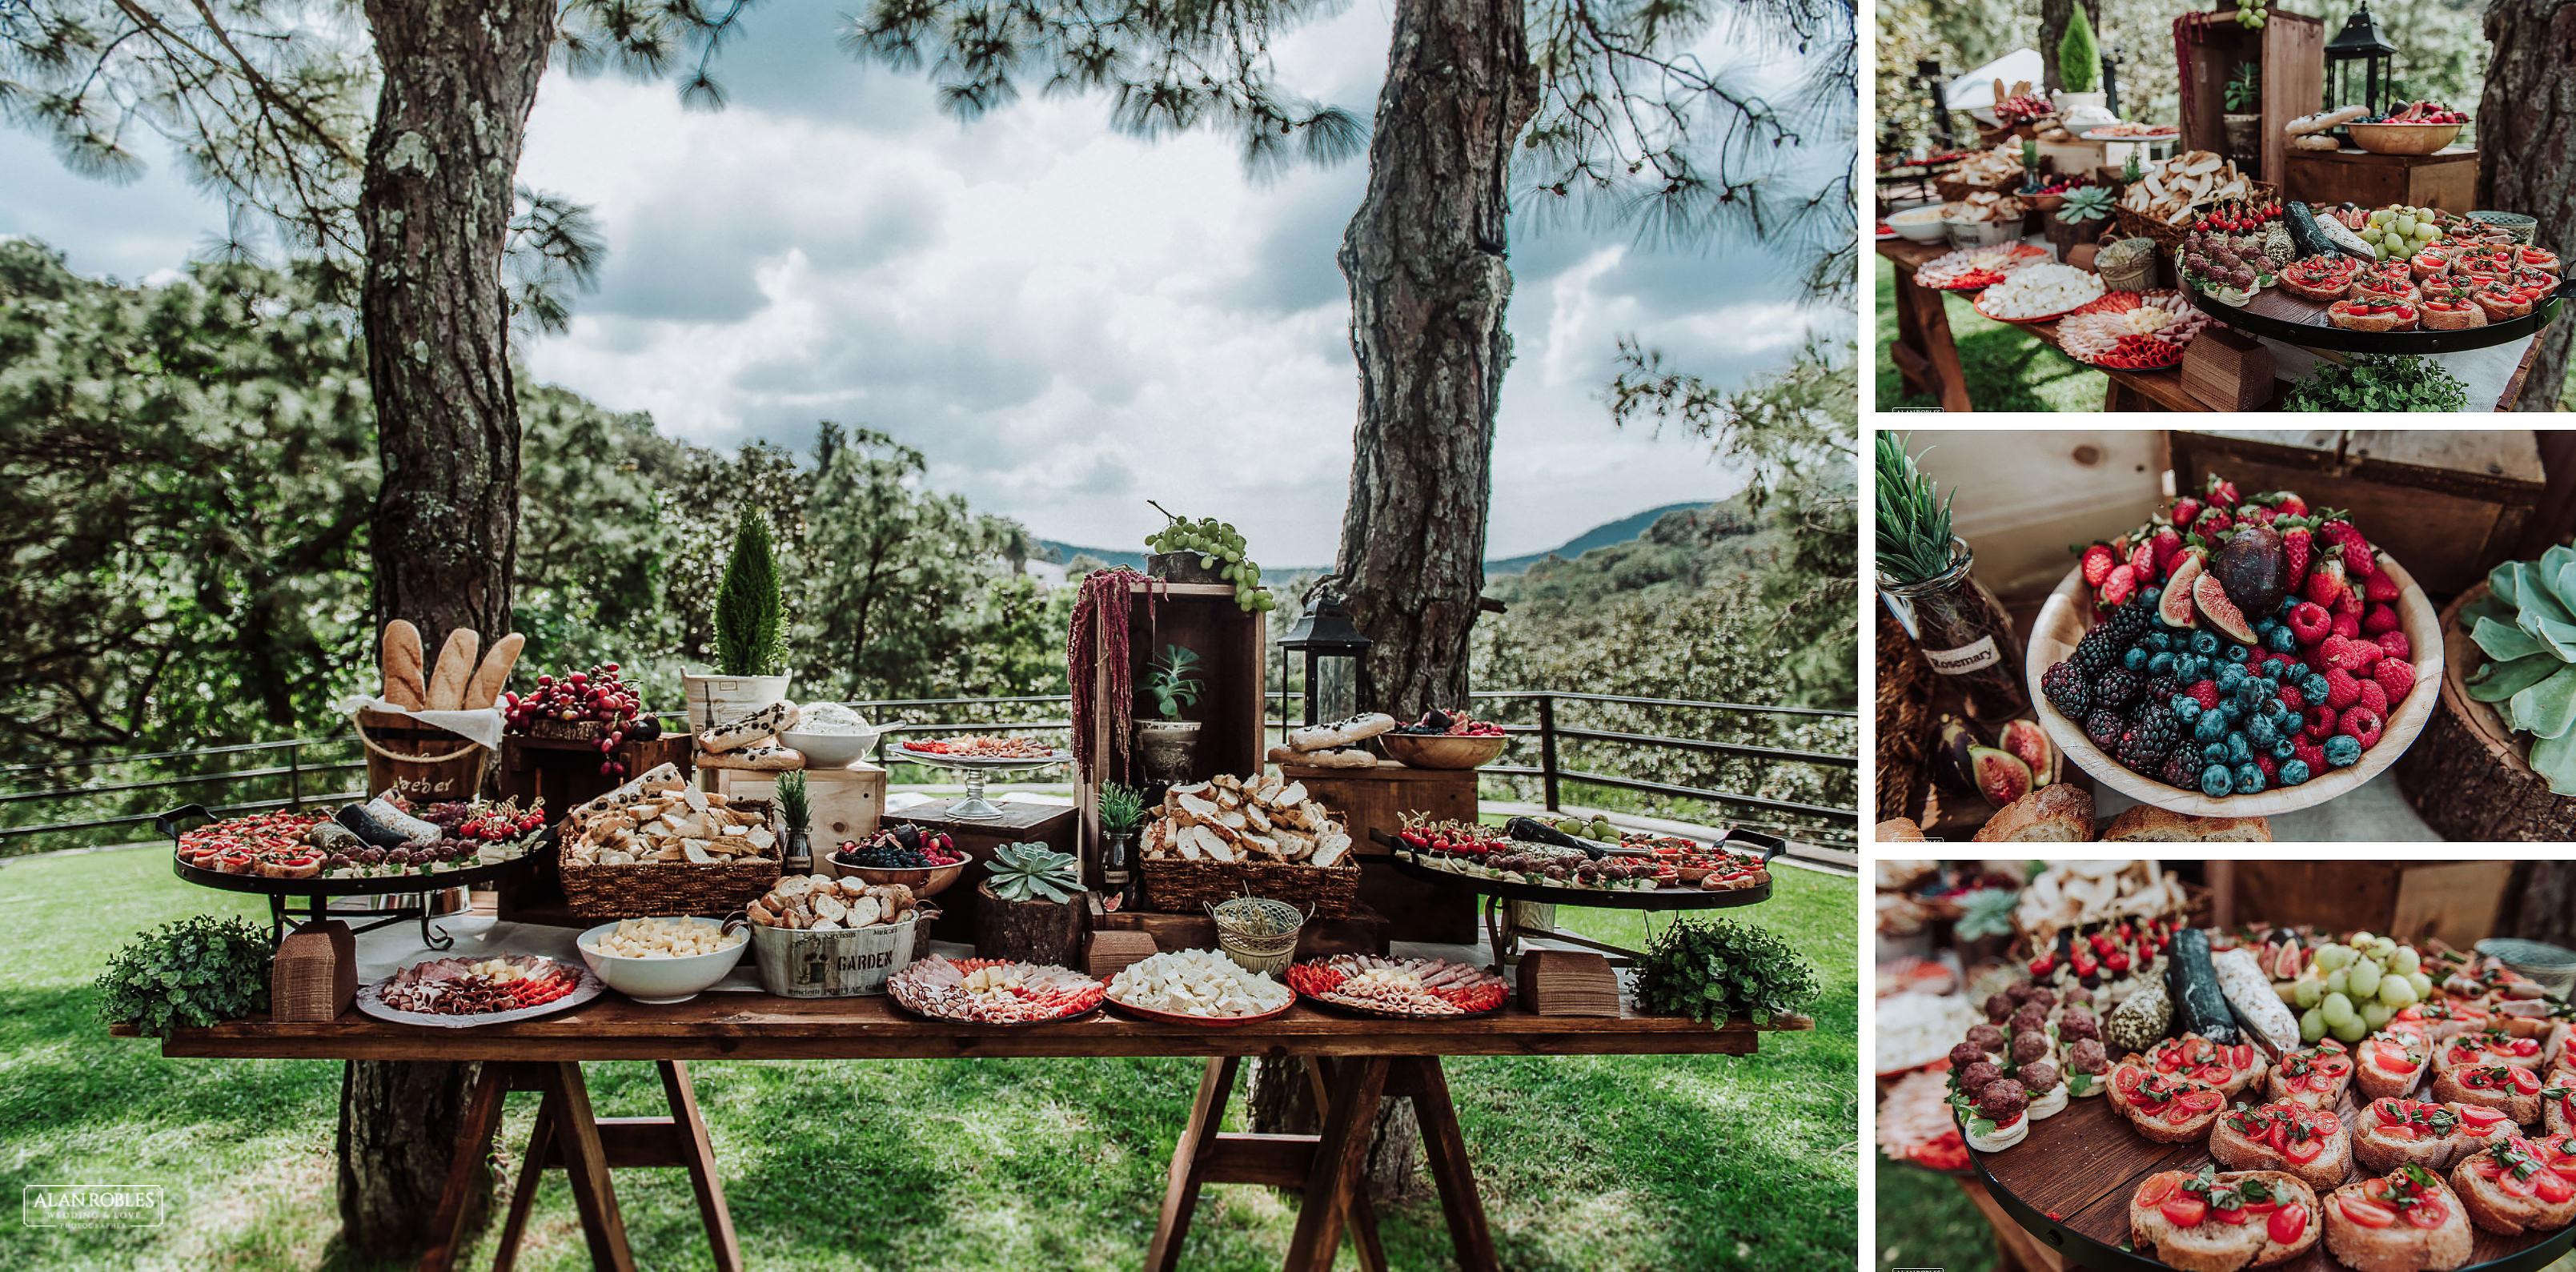 Fotografo de bodas guadalajara Alan Robles - Pinare terraza bistro 24